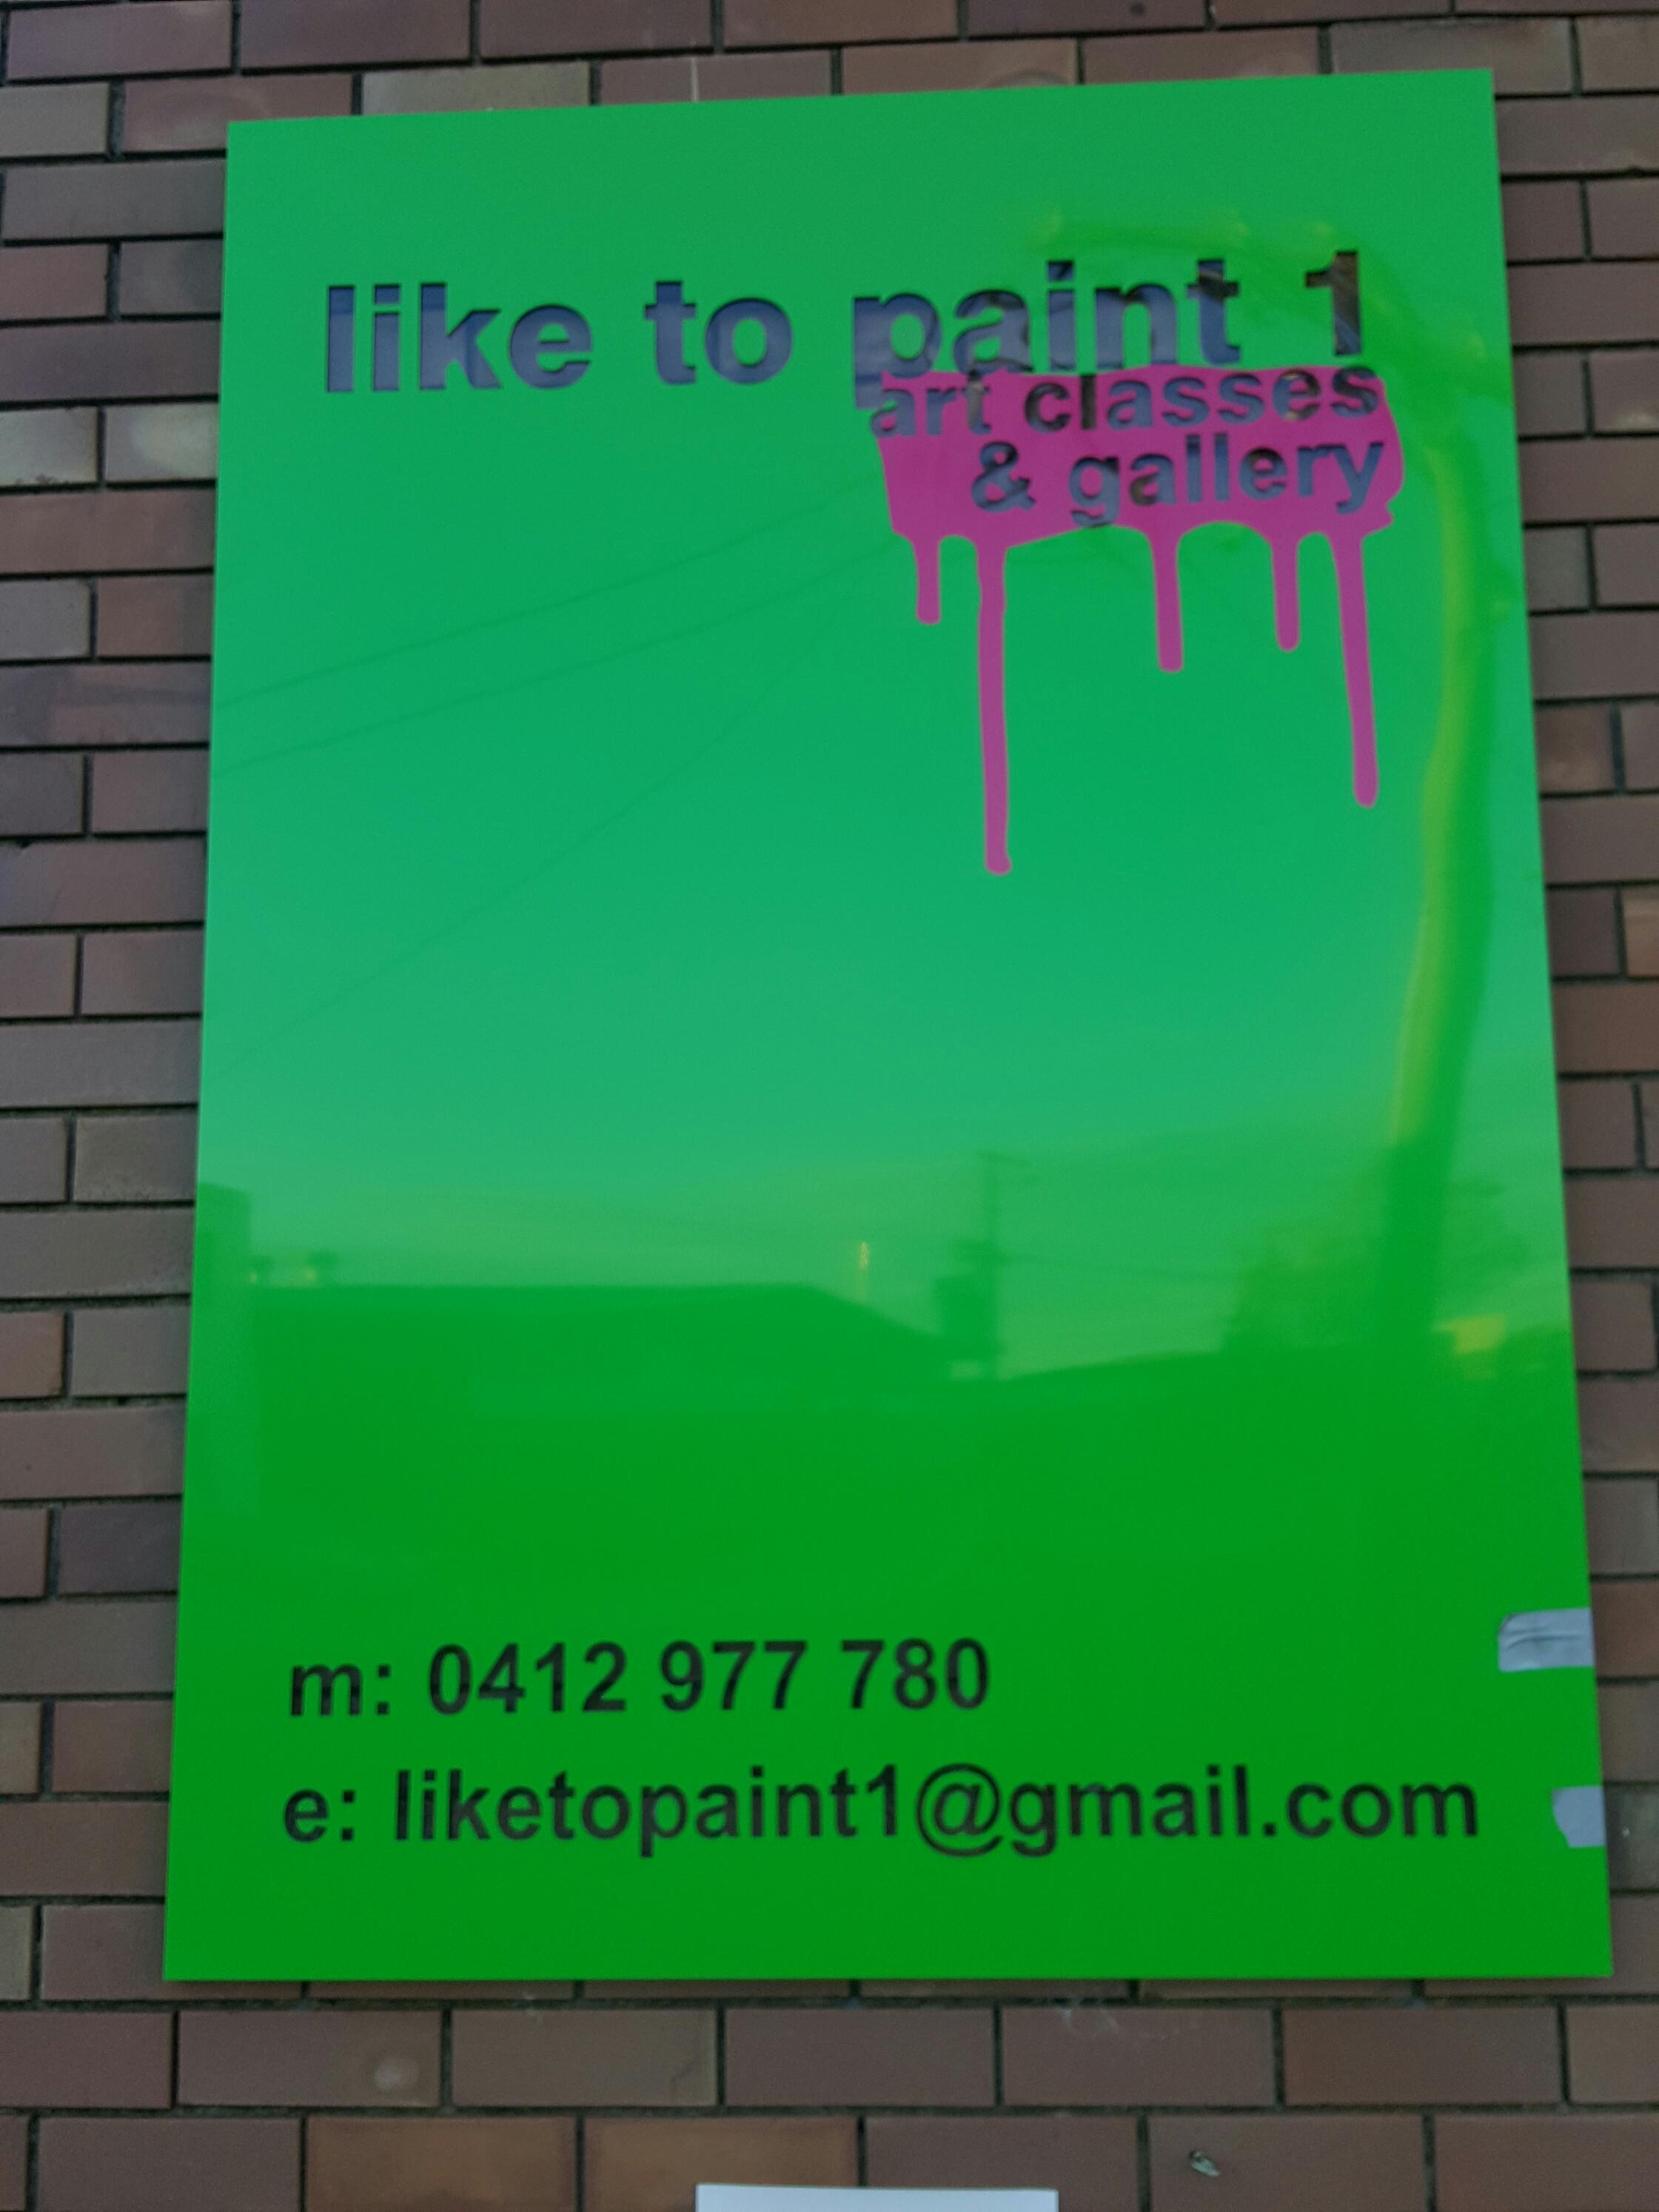 liketopaint1 art classes